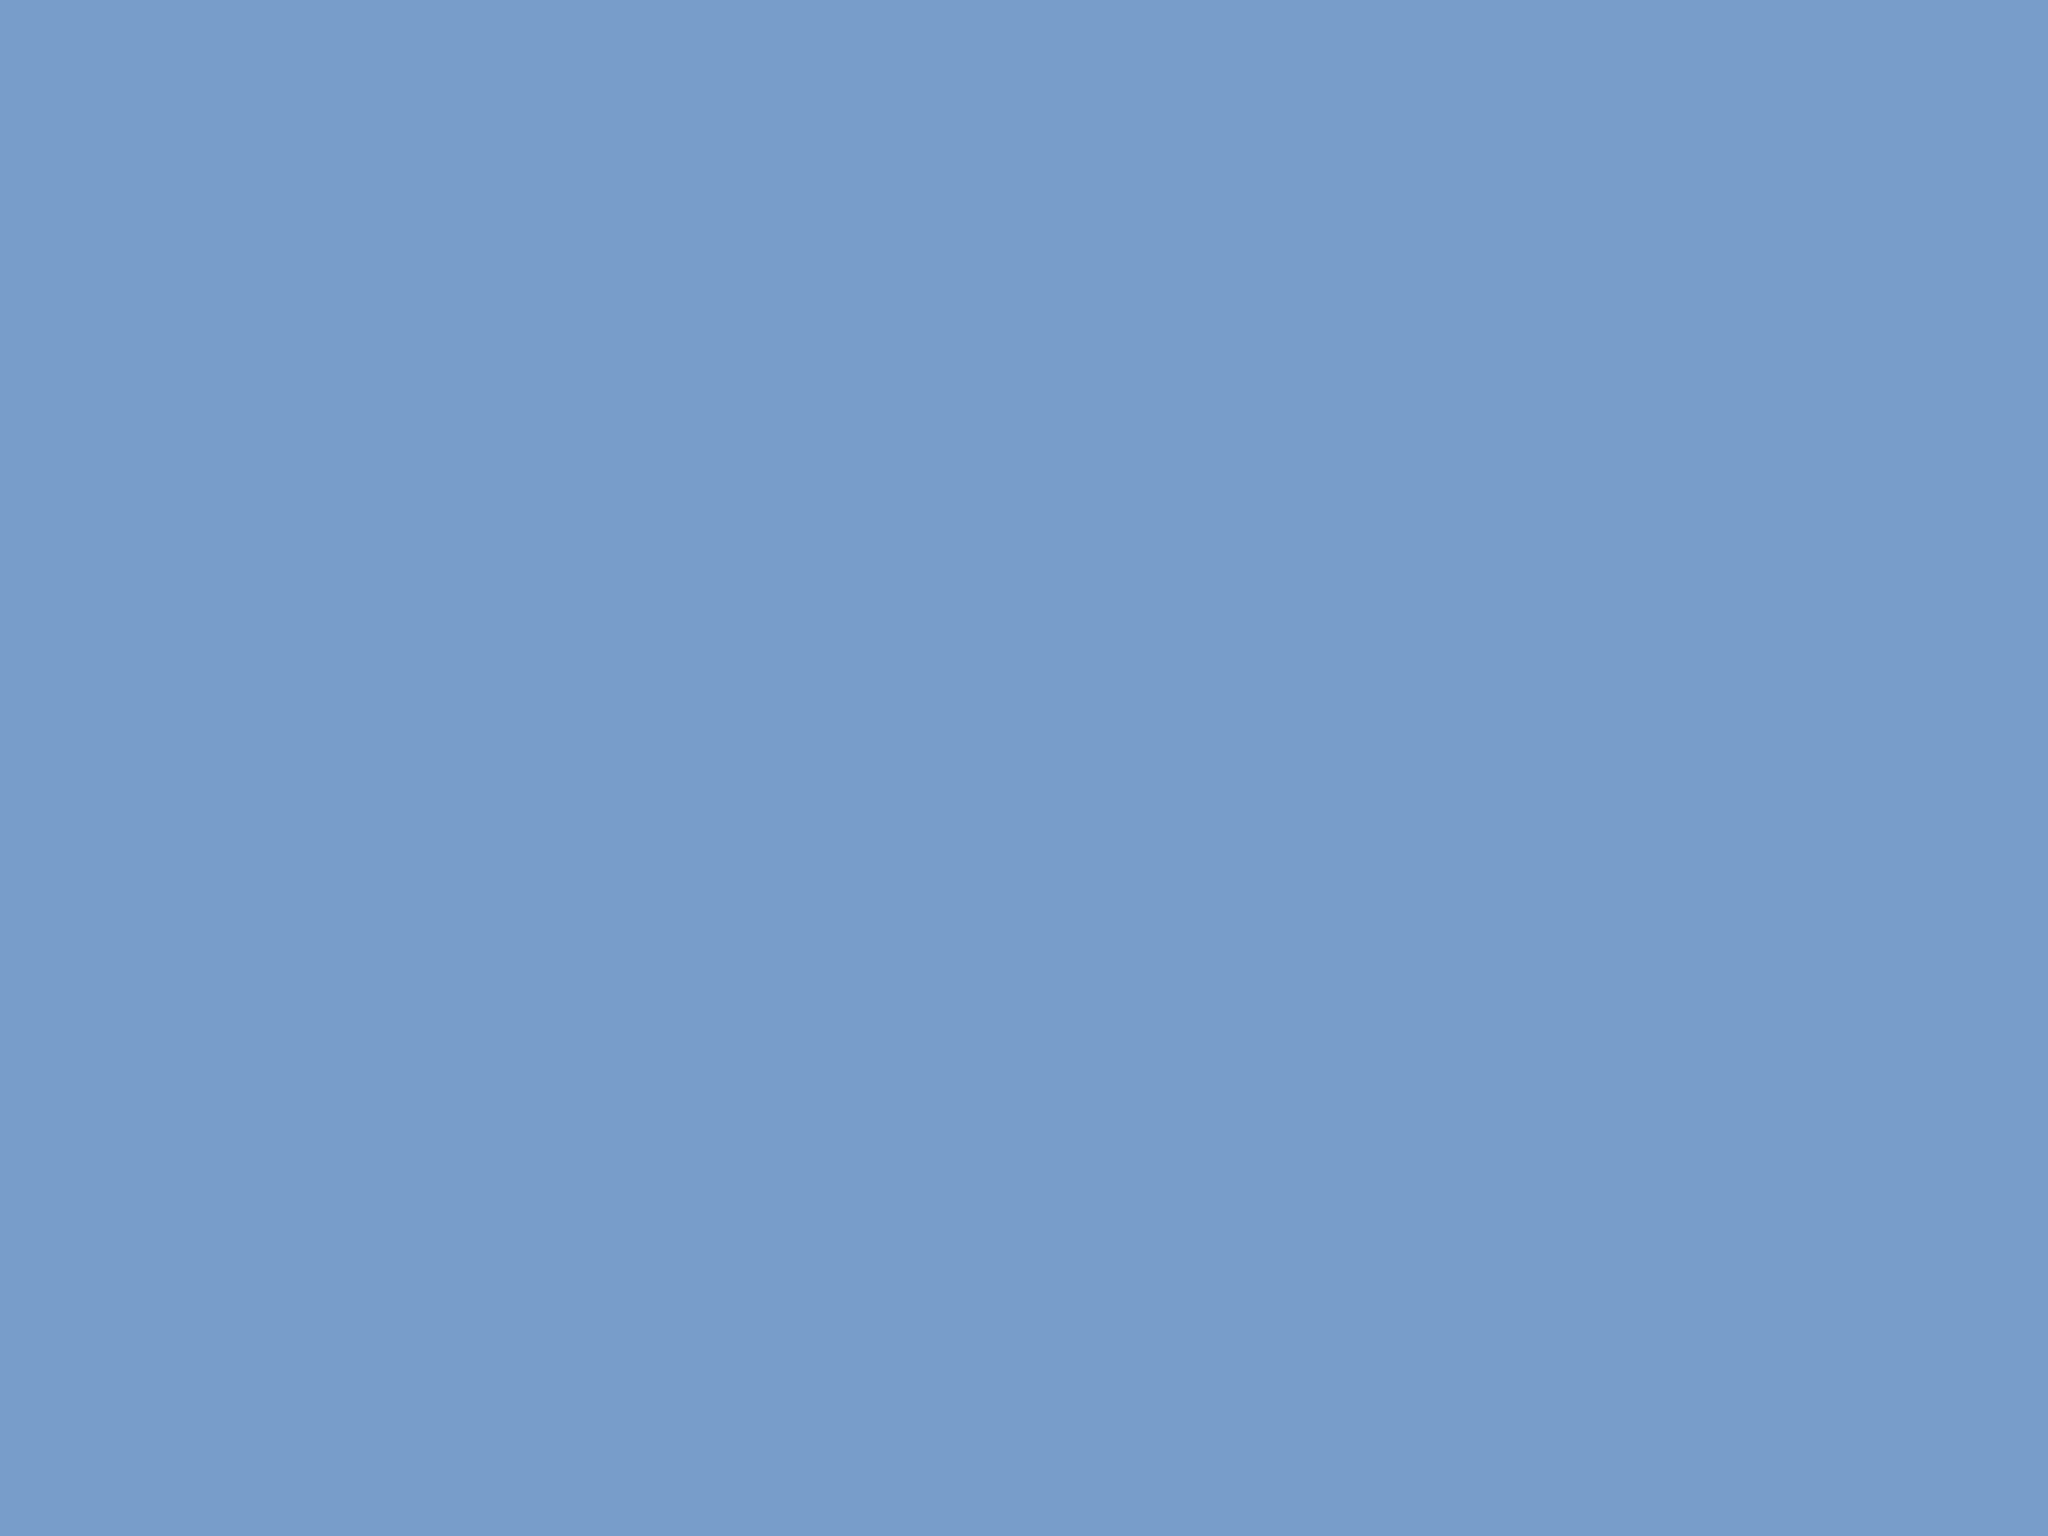 2048x1536 Dark Pastel Blue Solid Color Background